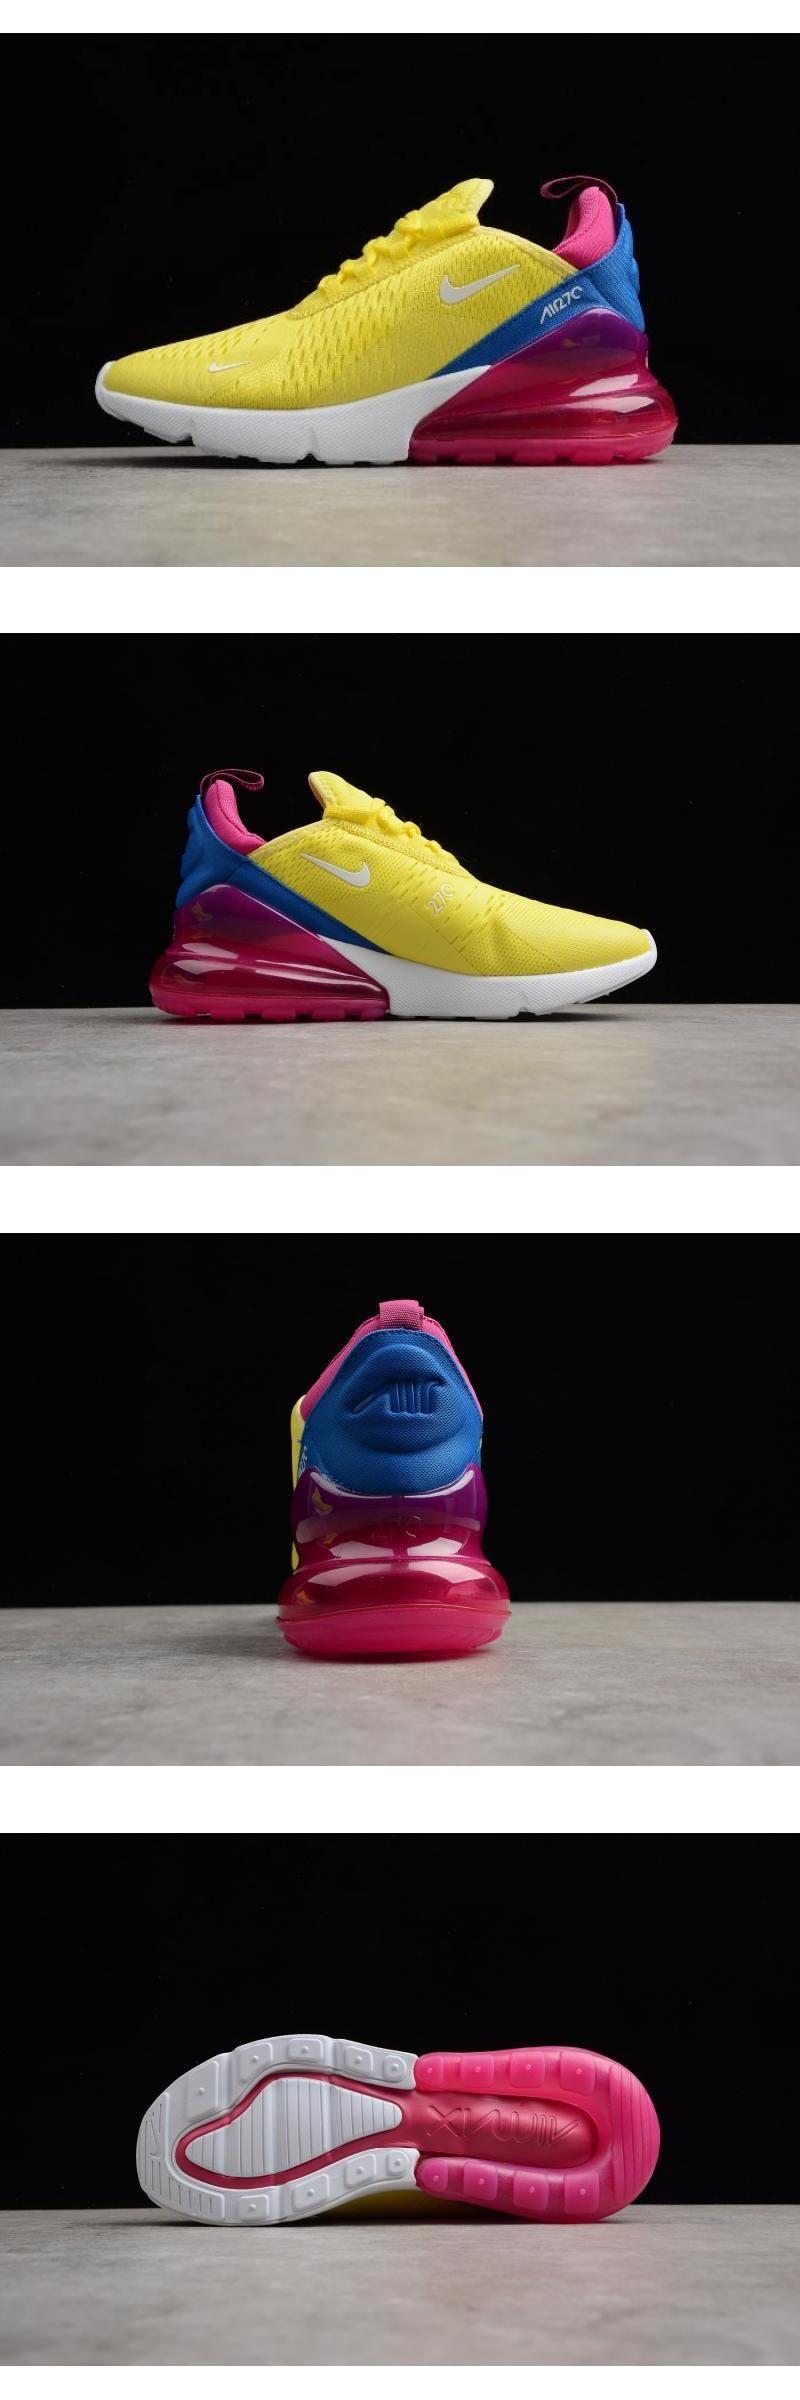 Women's Nike Air Max 270 Bright Lemon YellowWhite Racer